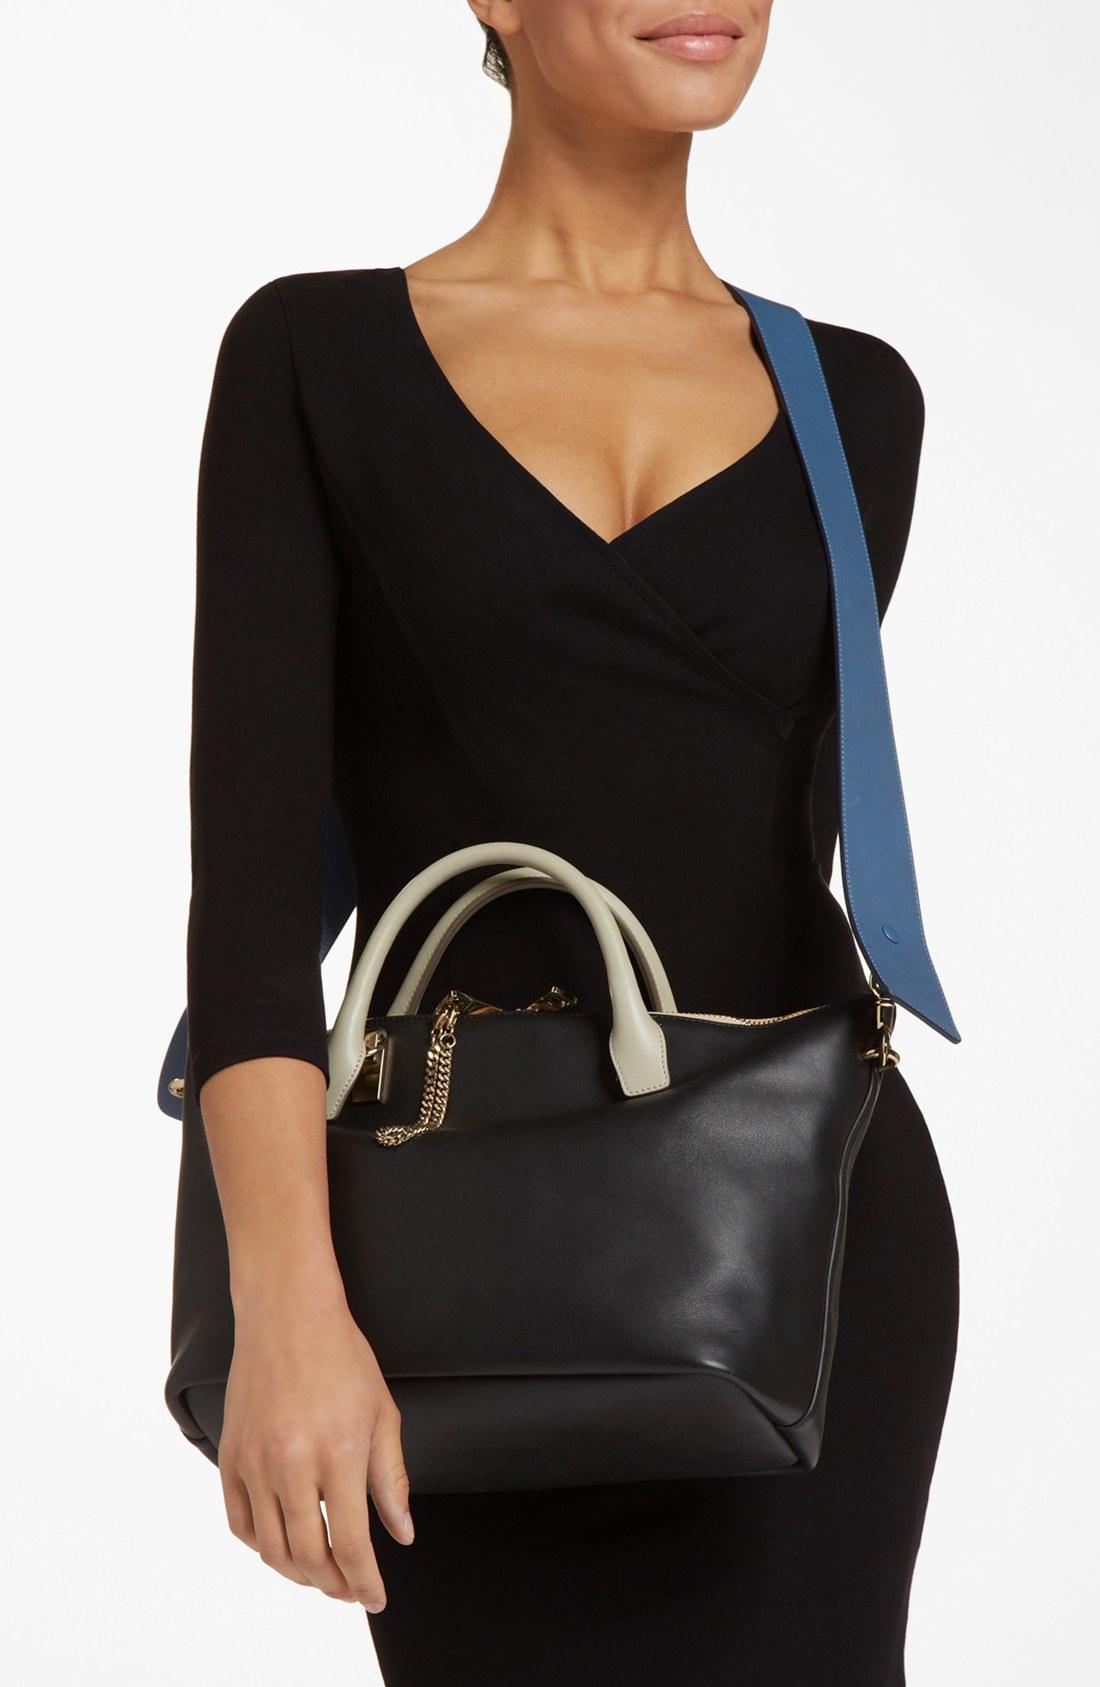 chloe bags online - Chlo�� \u0026#39;Baylee - Medium\u0026#39; Shoulder Bag in White (Marshmallow Grey ...